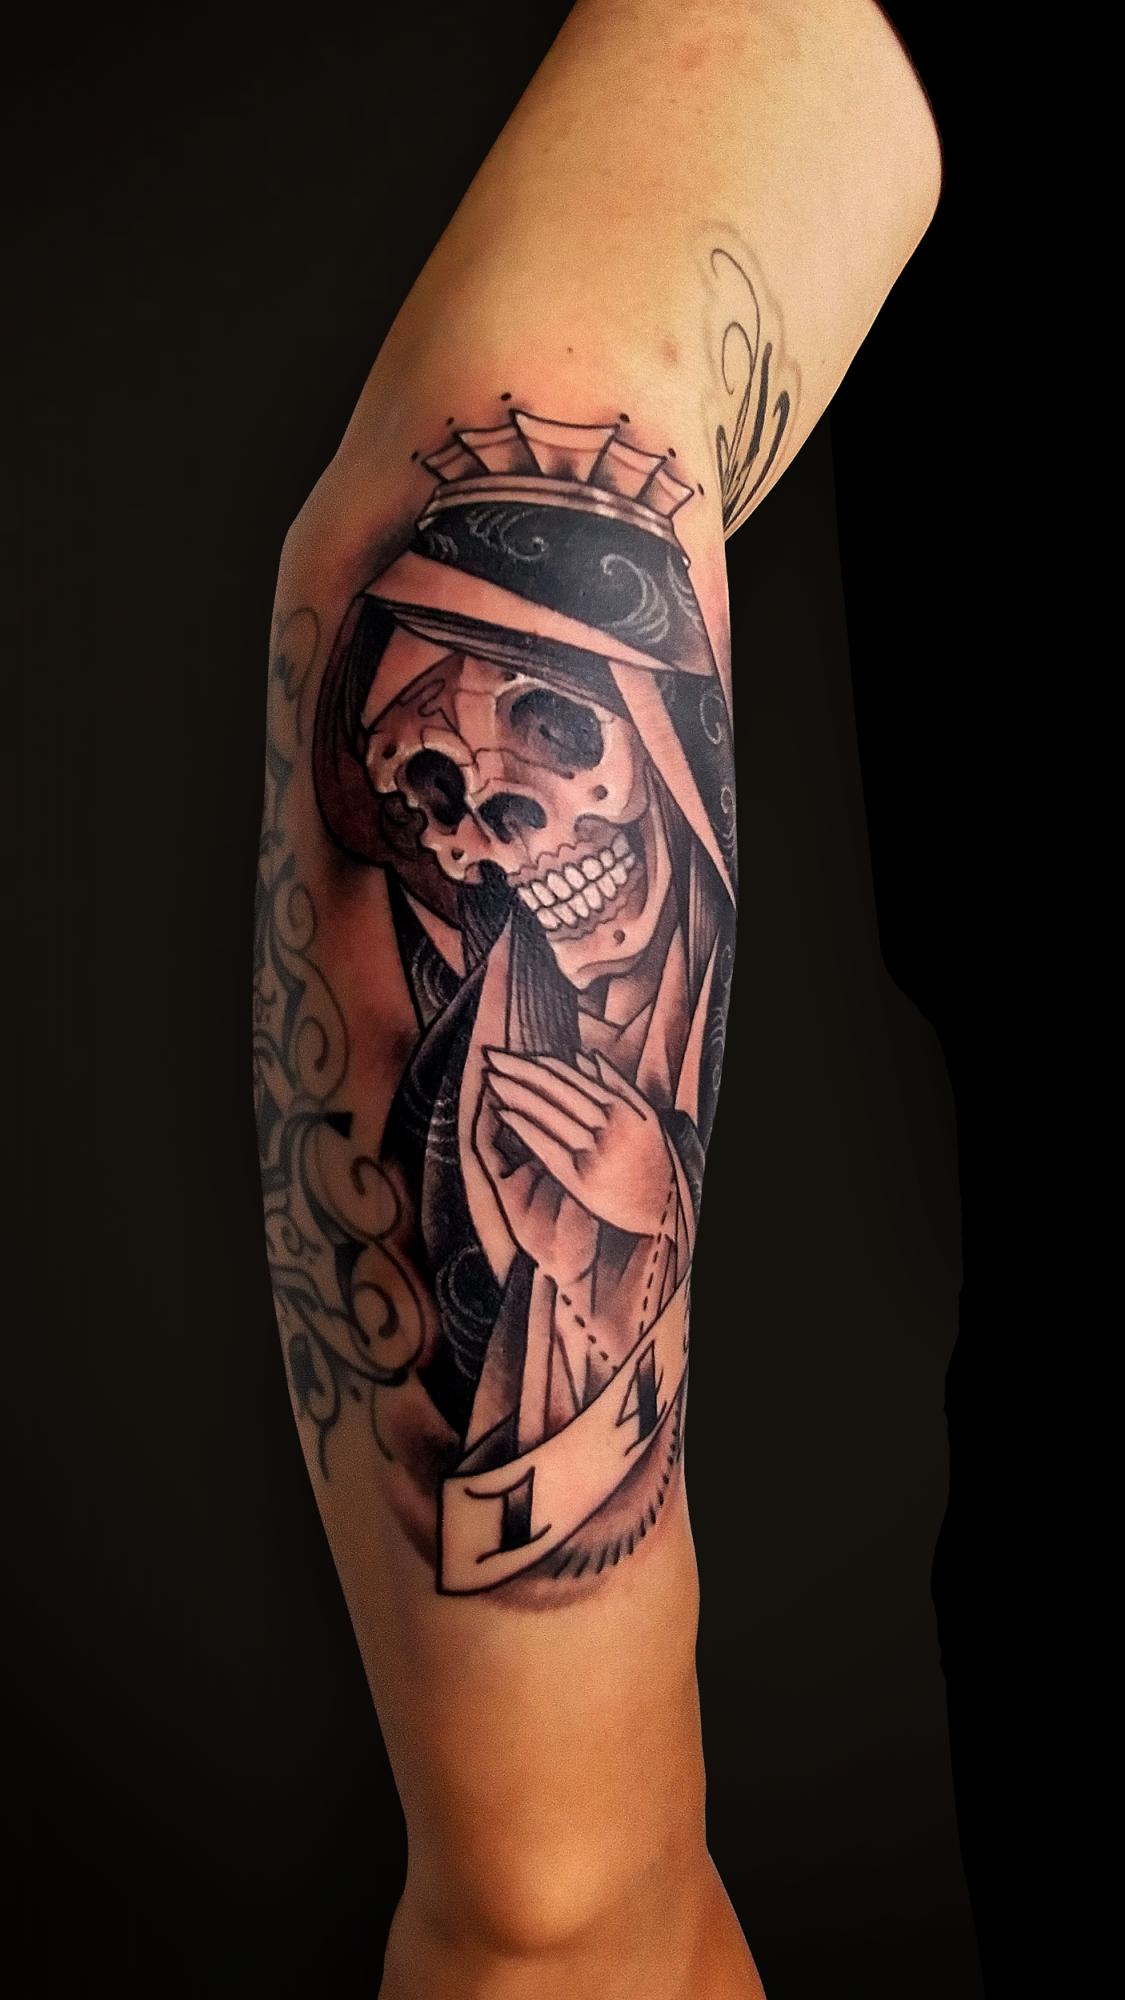 KINGRAT TATTOO 作品 | LAVA gallery | Tattoo artist: Yuji Anai | キングラット | ラバギャラリー | タトゥーアート | 福岡県北九州市 | 20210718_13b